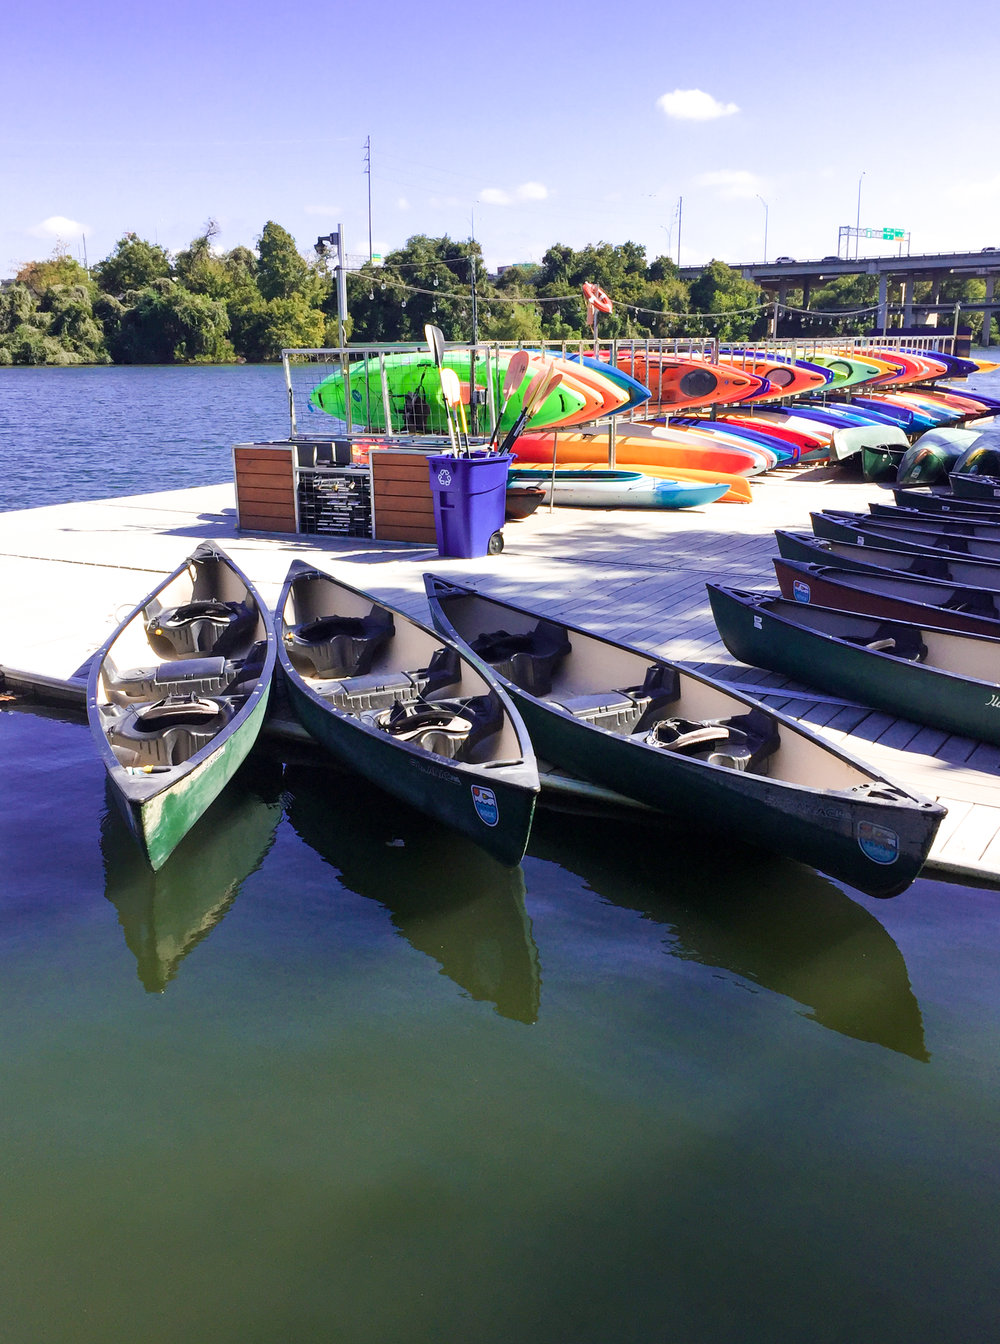 Rowing Dock Rentals Austin TX Wikerts in Wanderlust